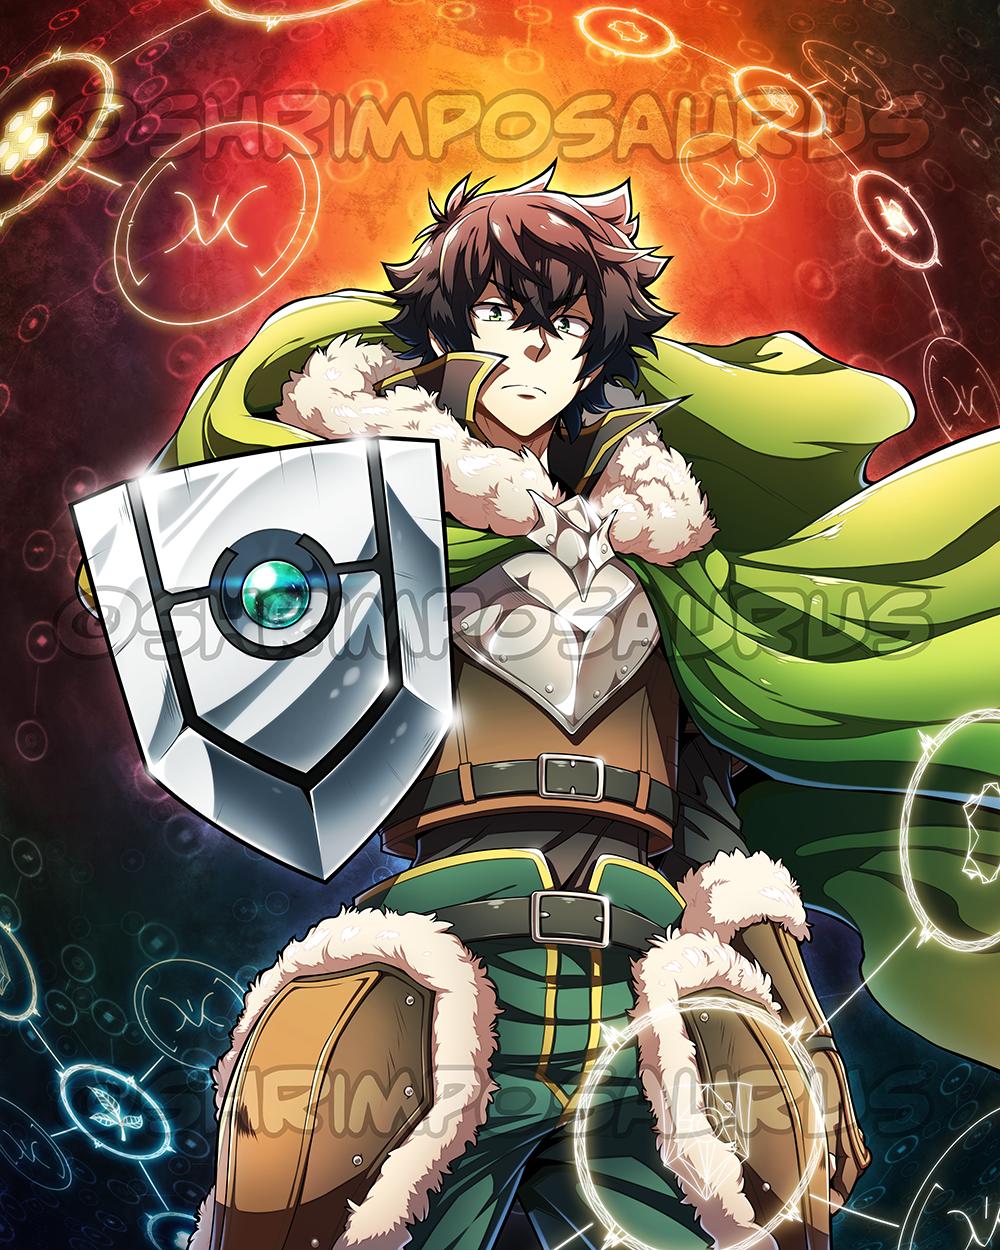 Shield Hero by shrimposaurus on DeviantArt Anime, Hero